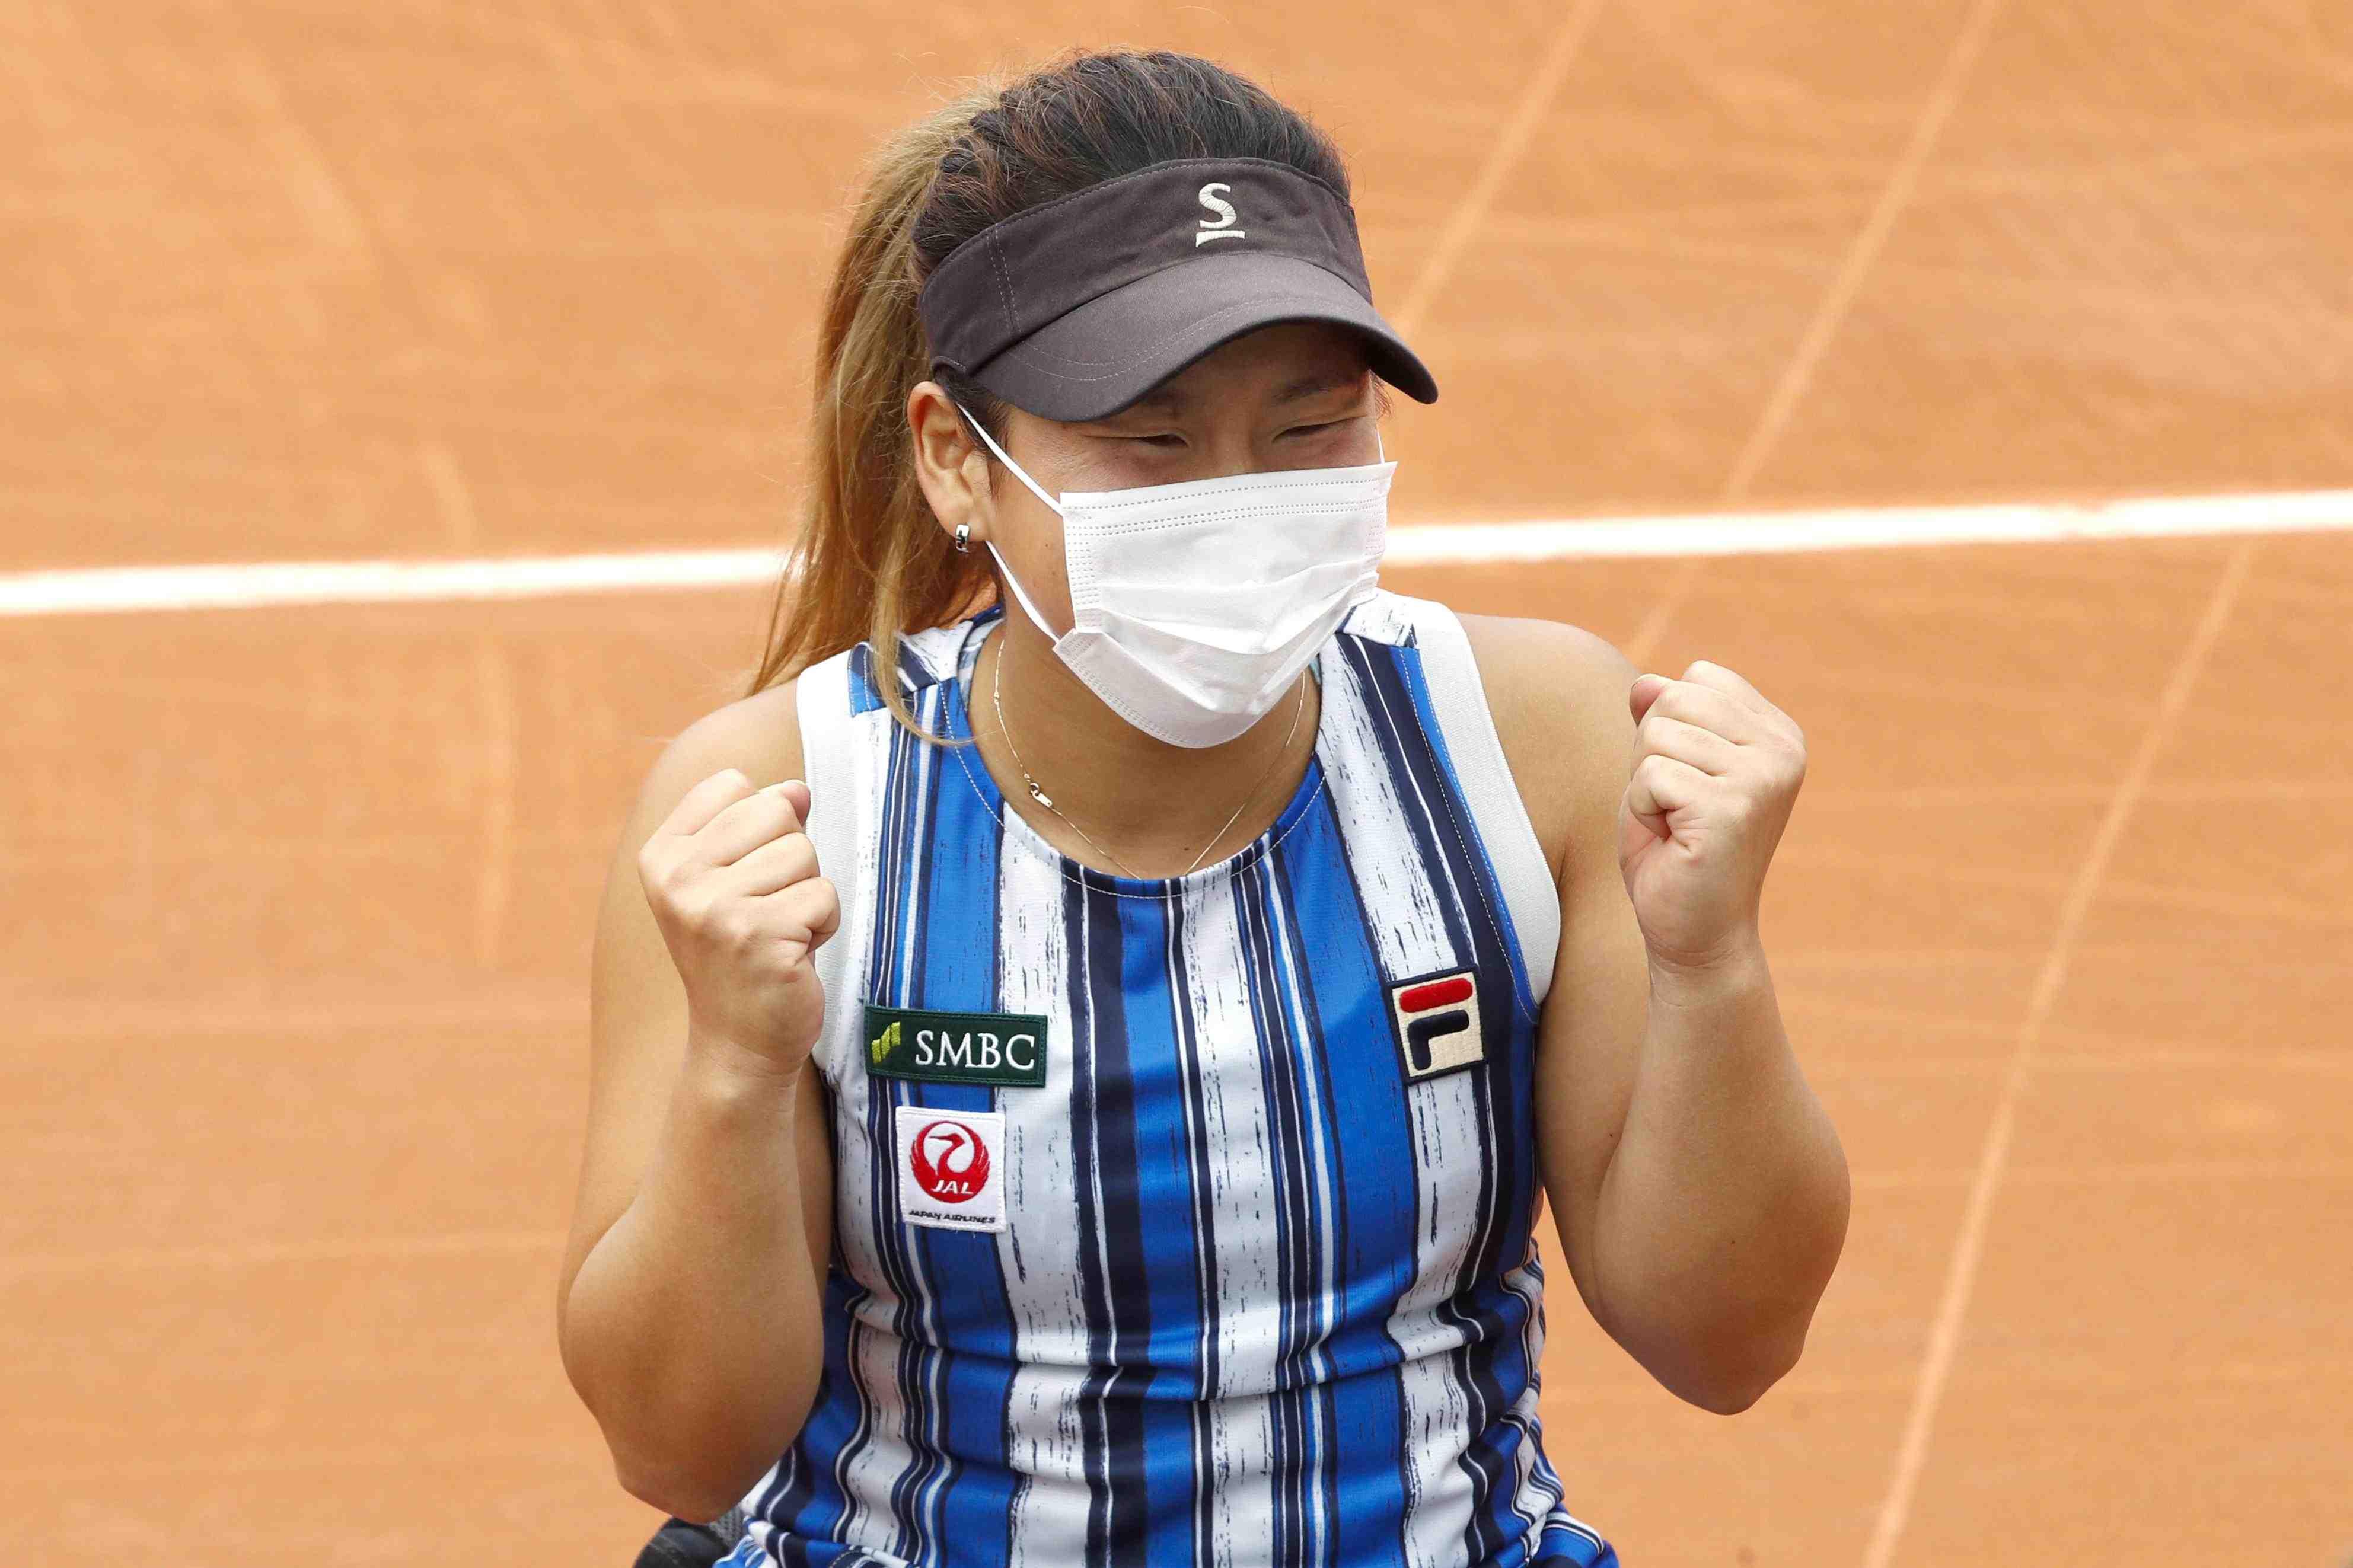 Japan's Yui Kamiji after winning the women's wheelchair final match of the French Open tennis 014